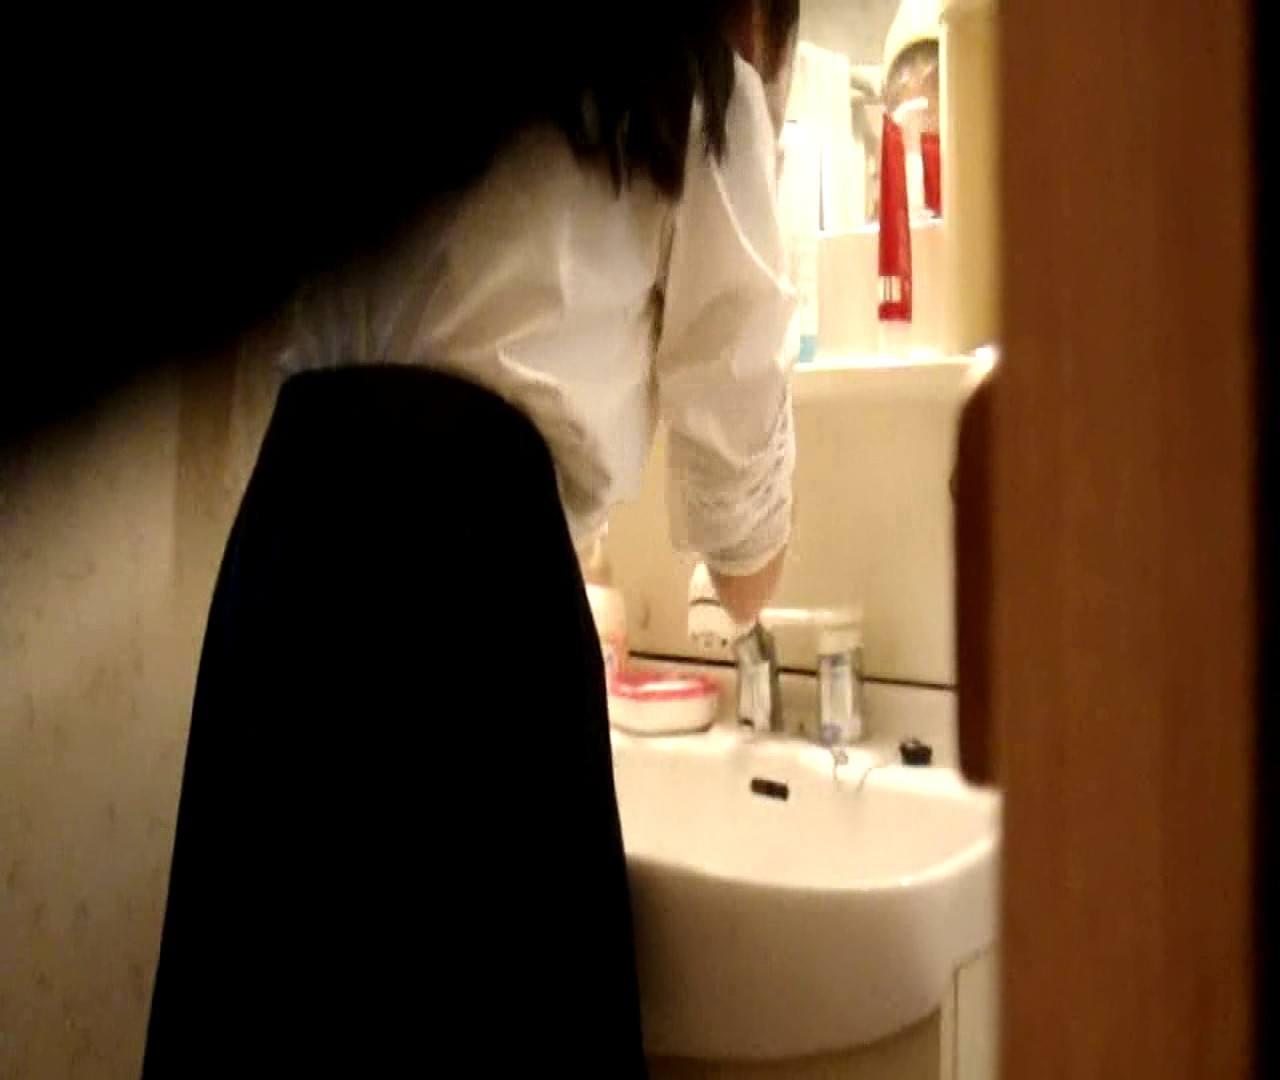 vol.5 まどかが帰宅後の洗顔後にブラを洗ってます。 ギャル達  112枚 52